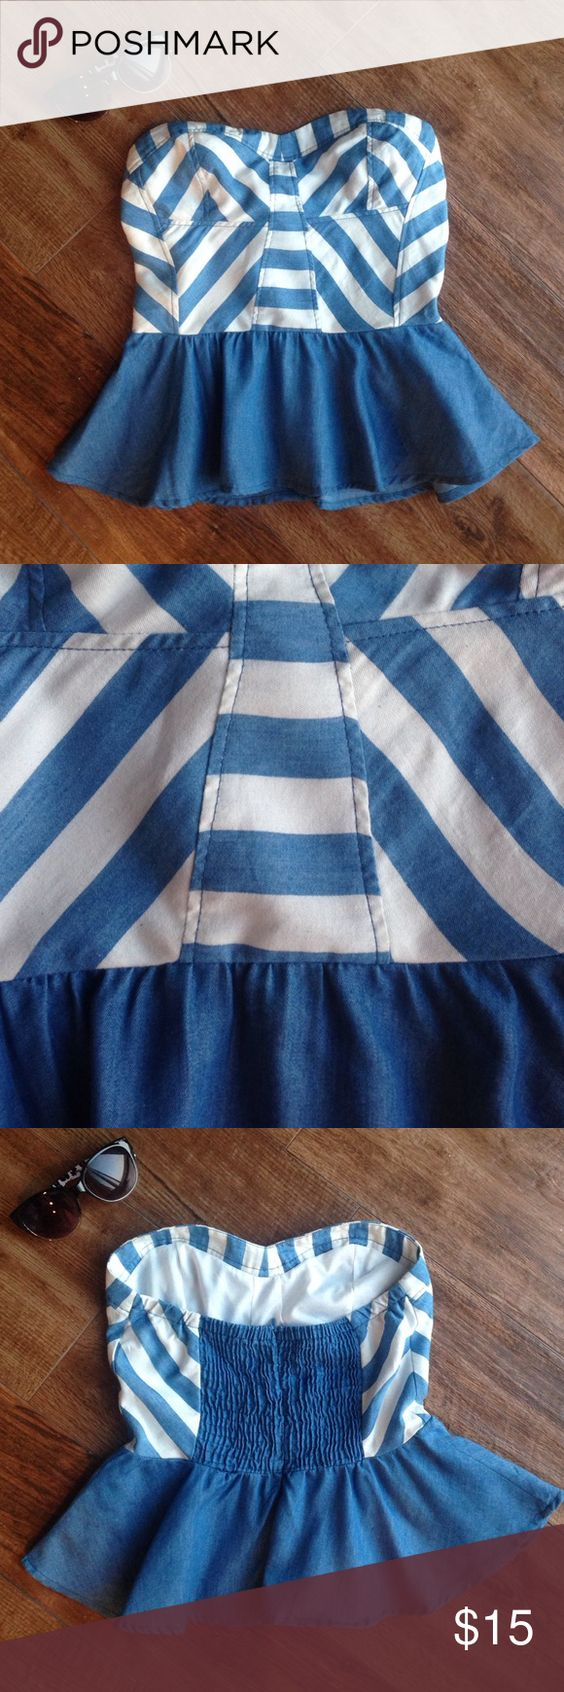 Final price ✨Peplum style cute shirt- size small Striped denim looking peplum shirt Tops Blouses